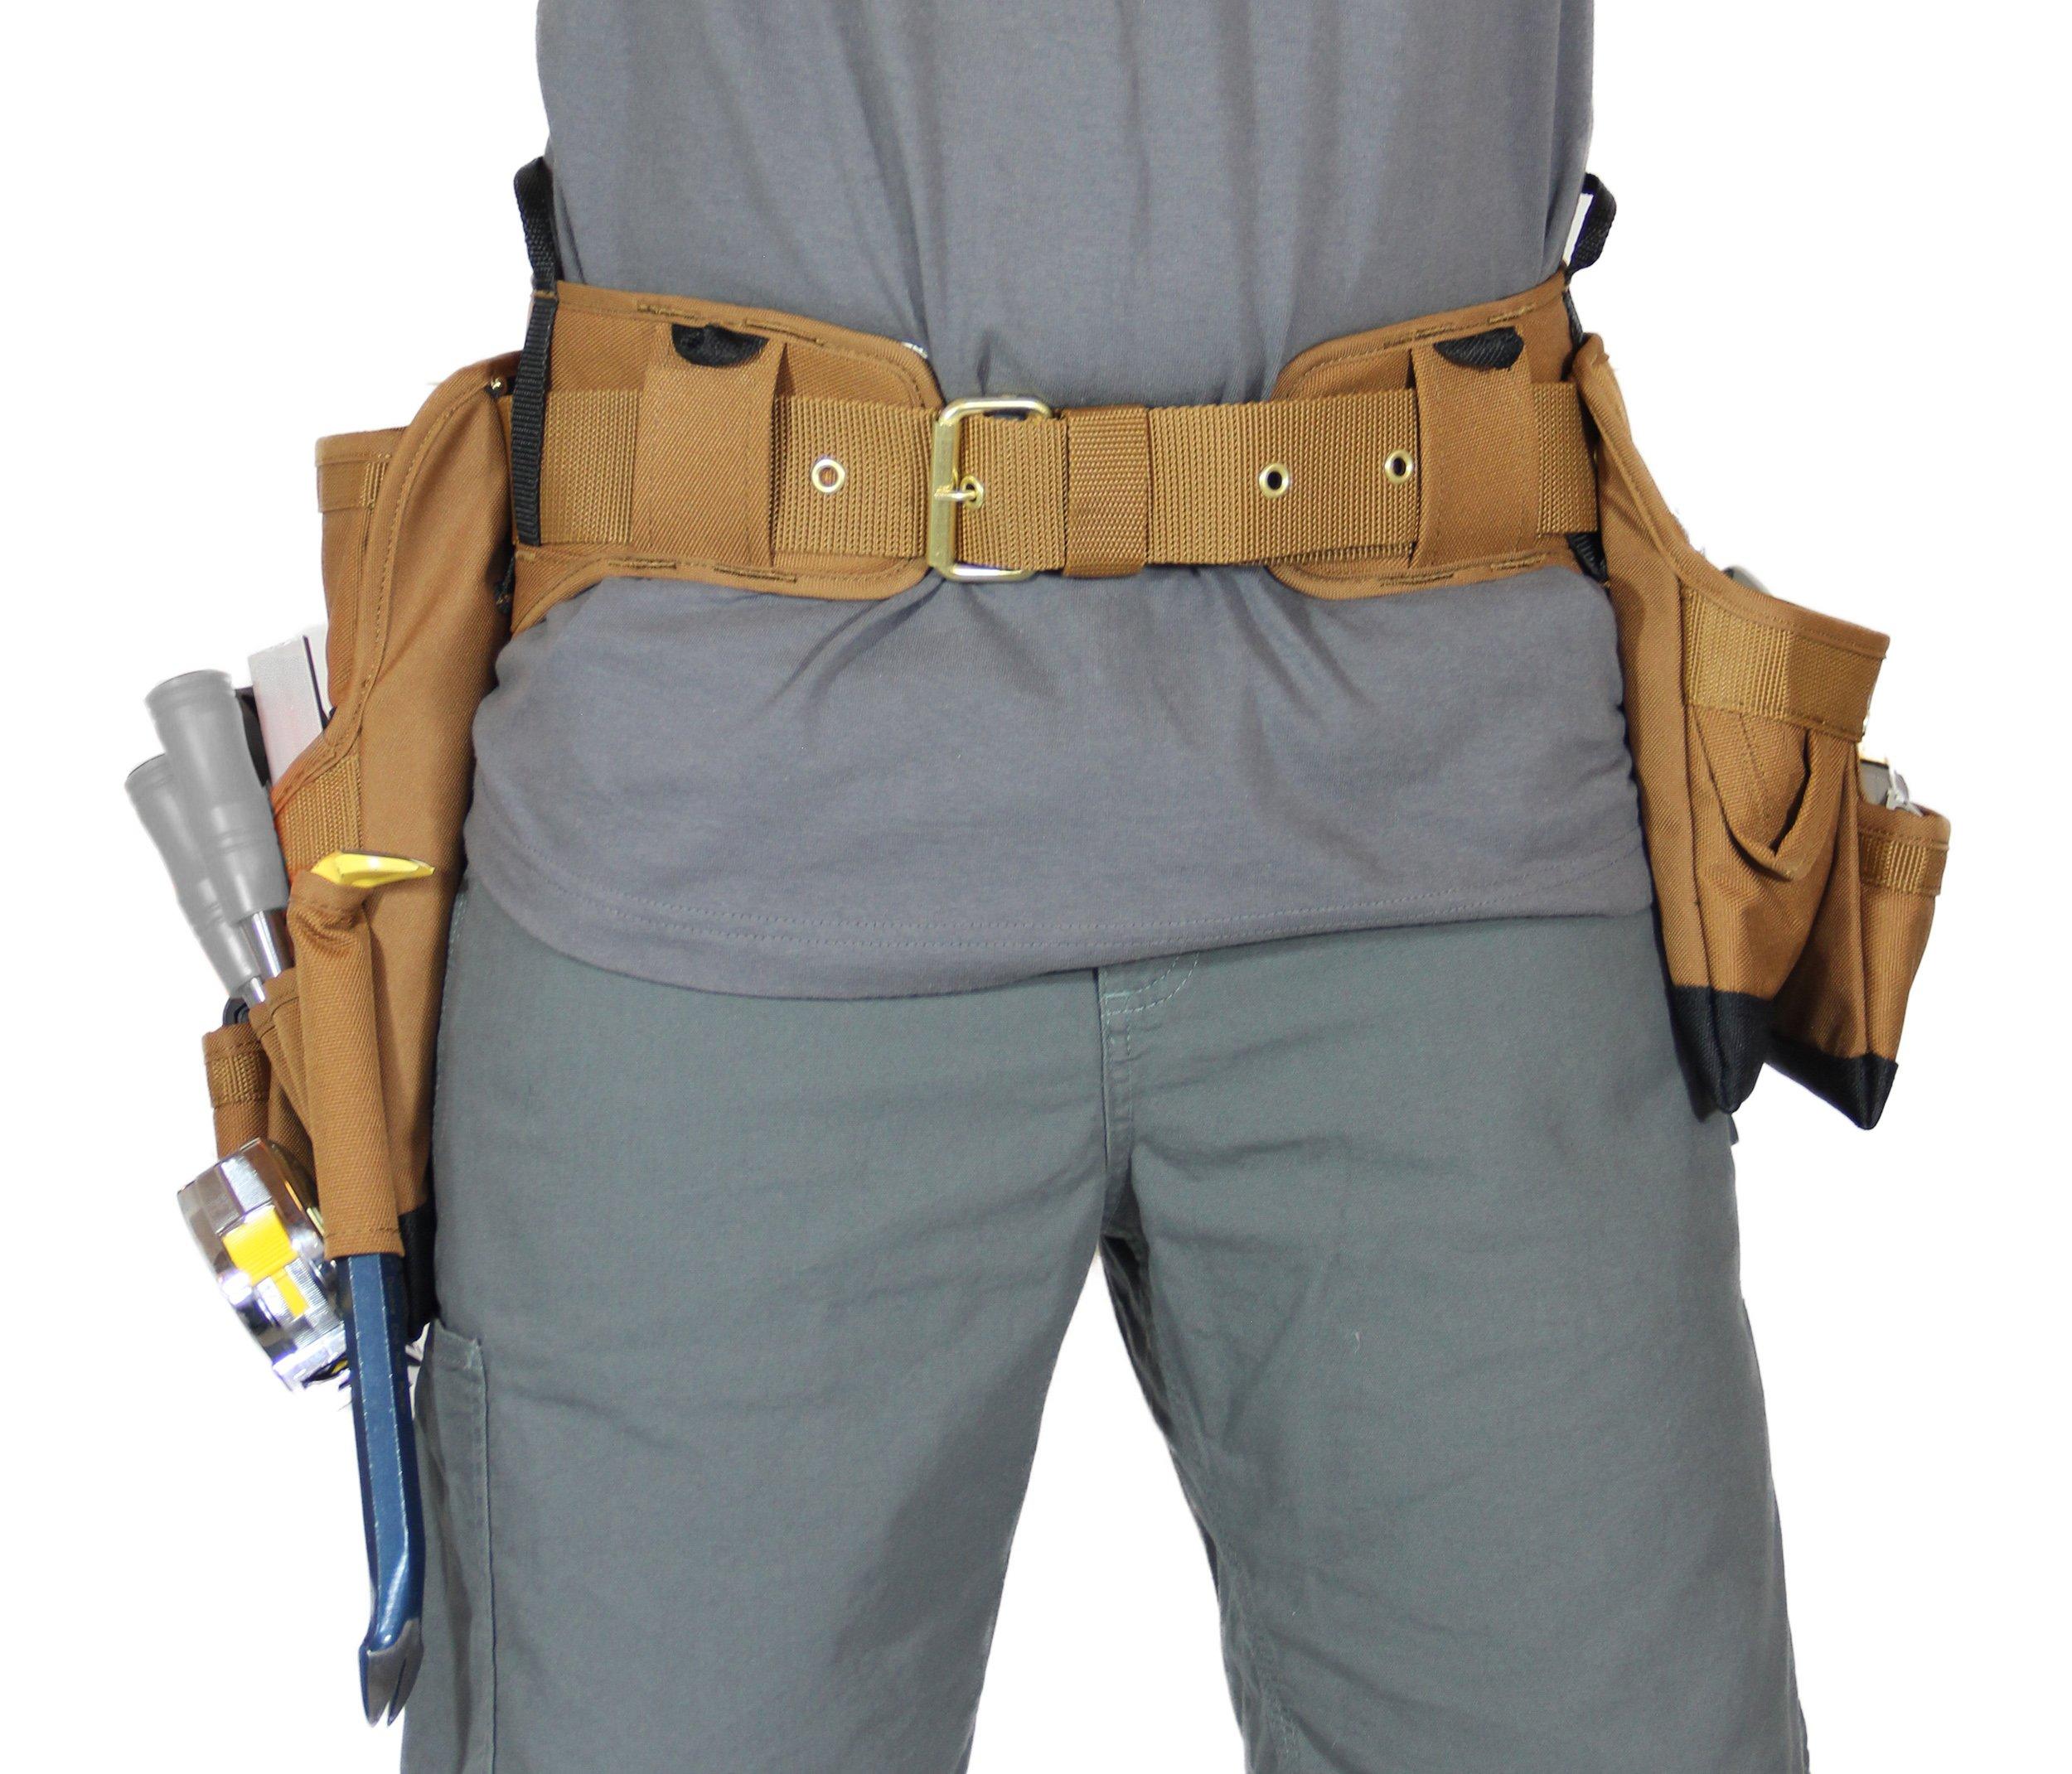 Carhartt Legacy Build Your Own Belt Custom Tool Belt, Padded by Carhartt (Image #3)